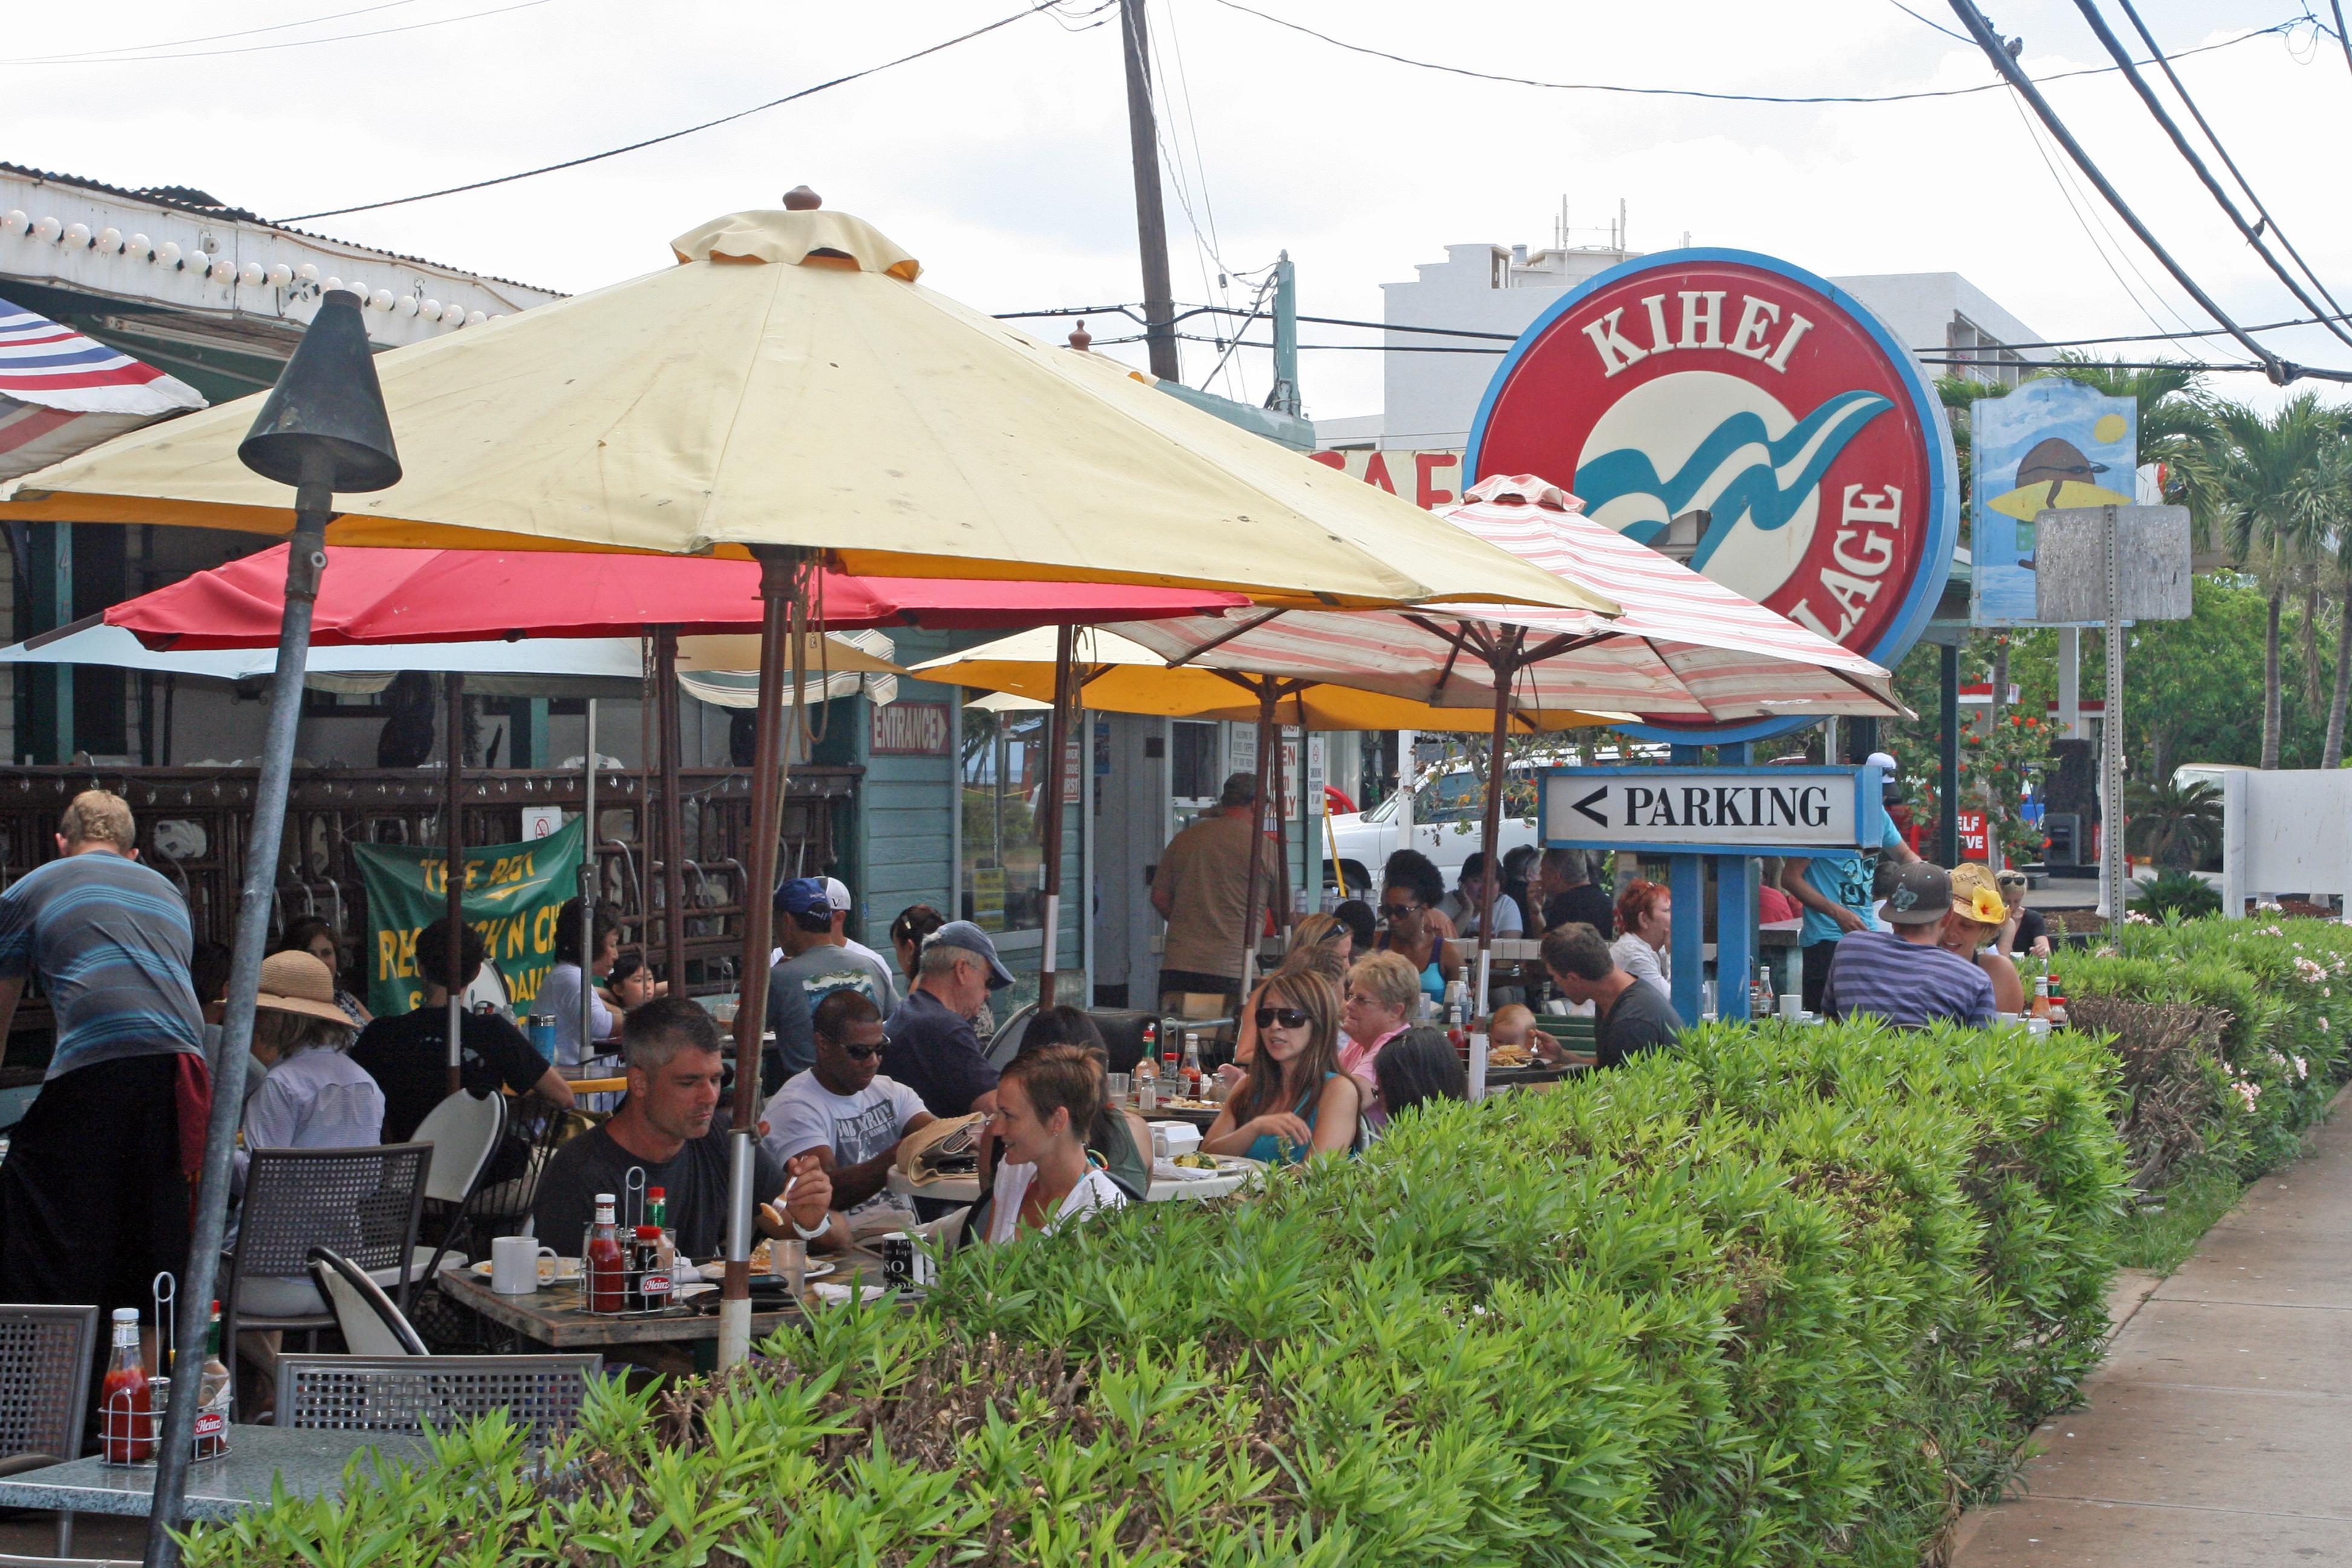 Kihei Restaurants Welcome To Maui